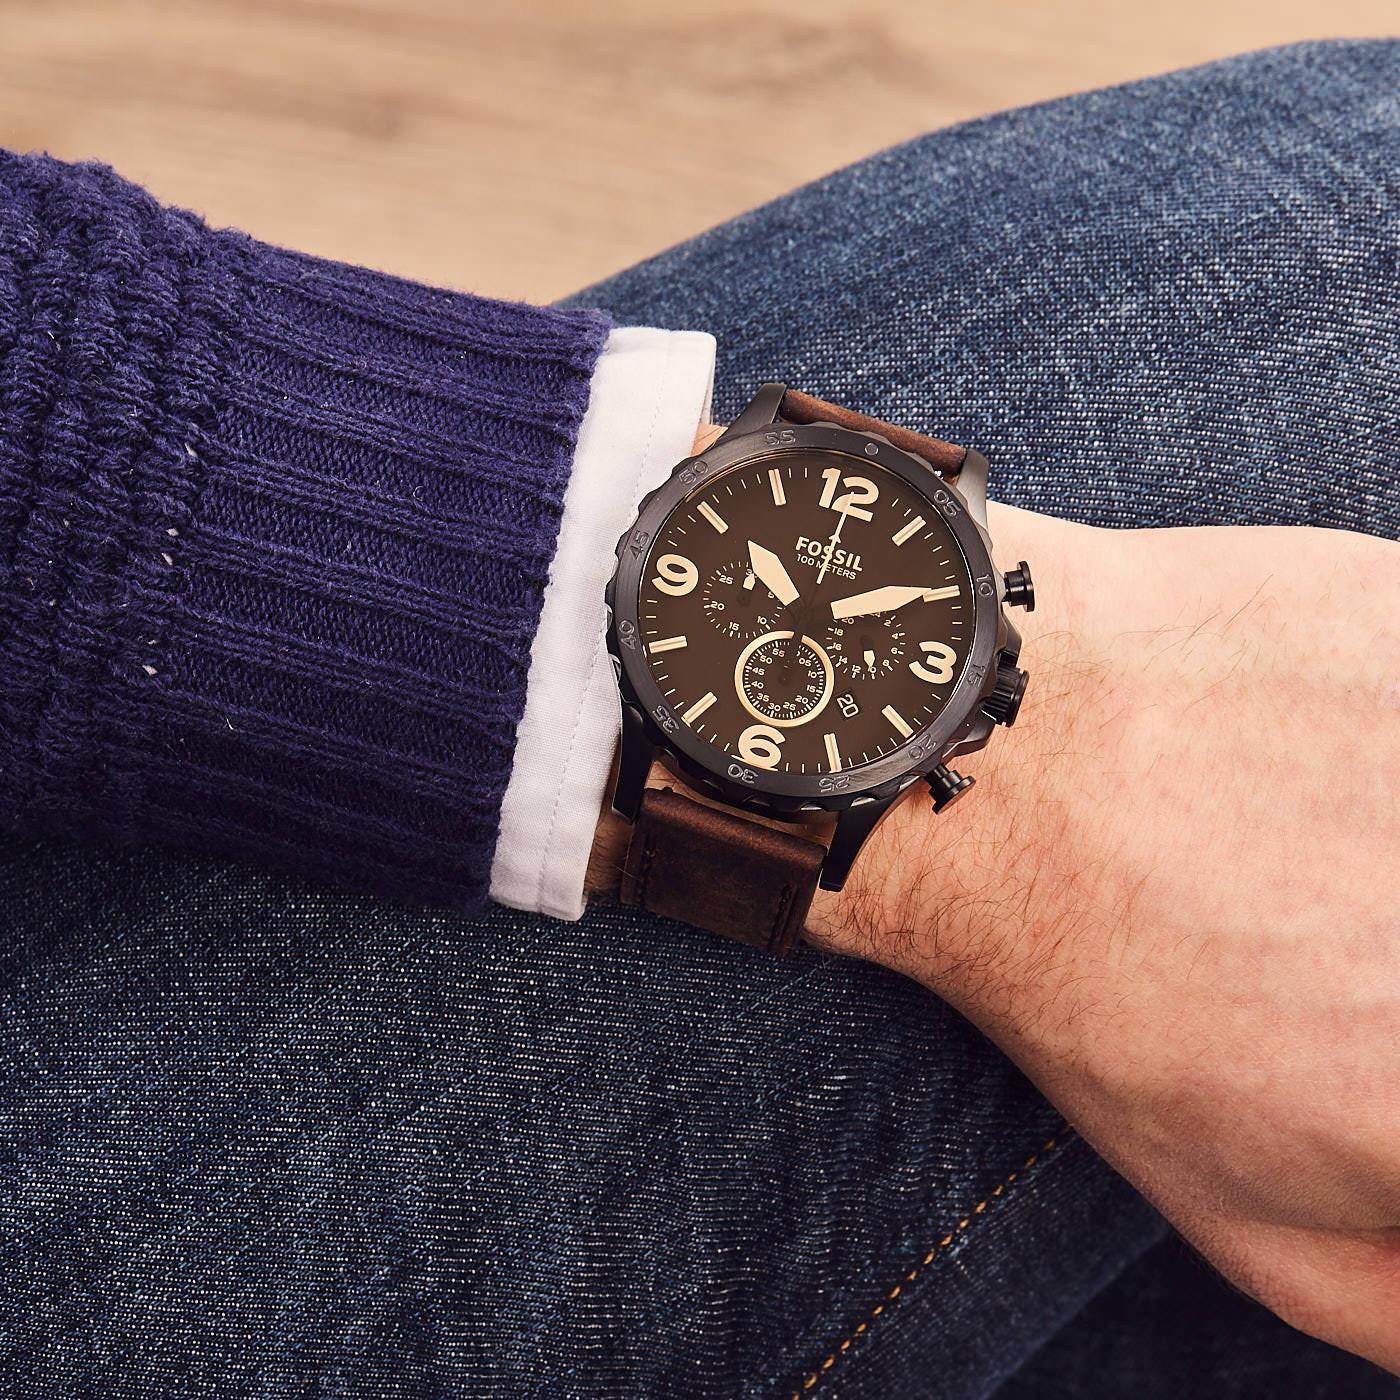 8441203a9db1 Fossil Nate reloj JR1487 - Relojes